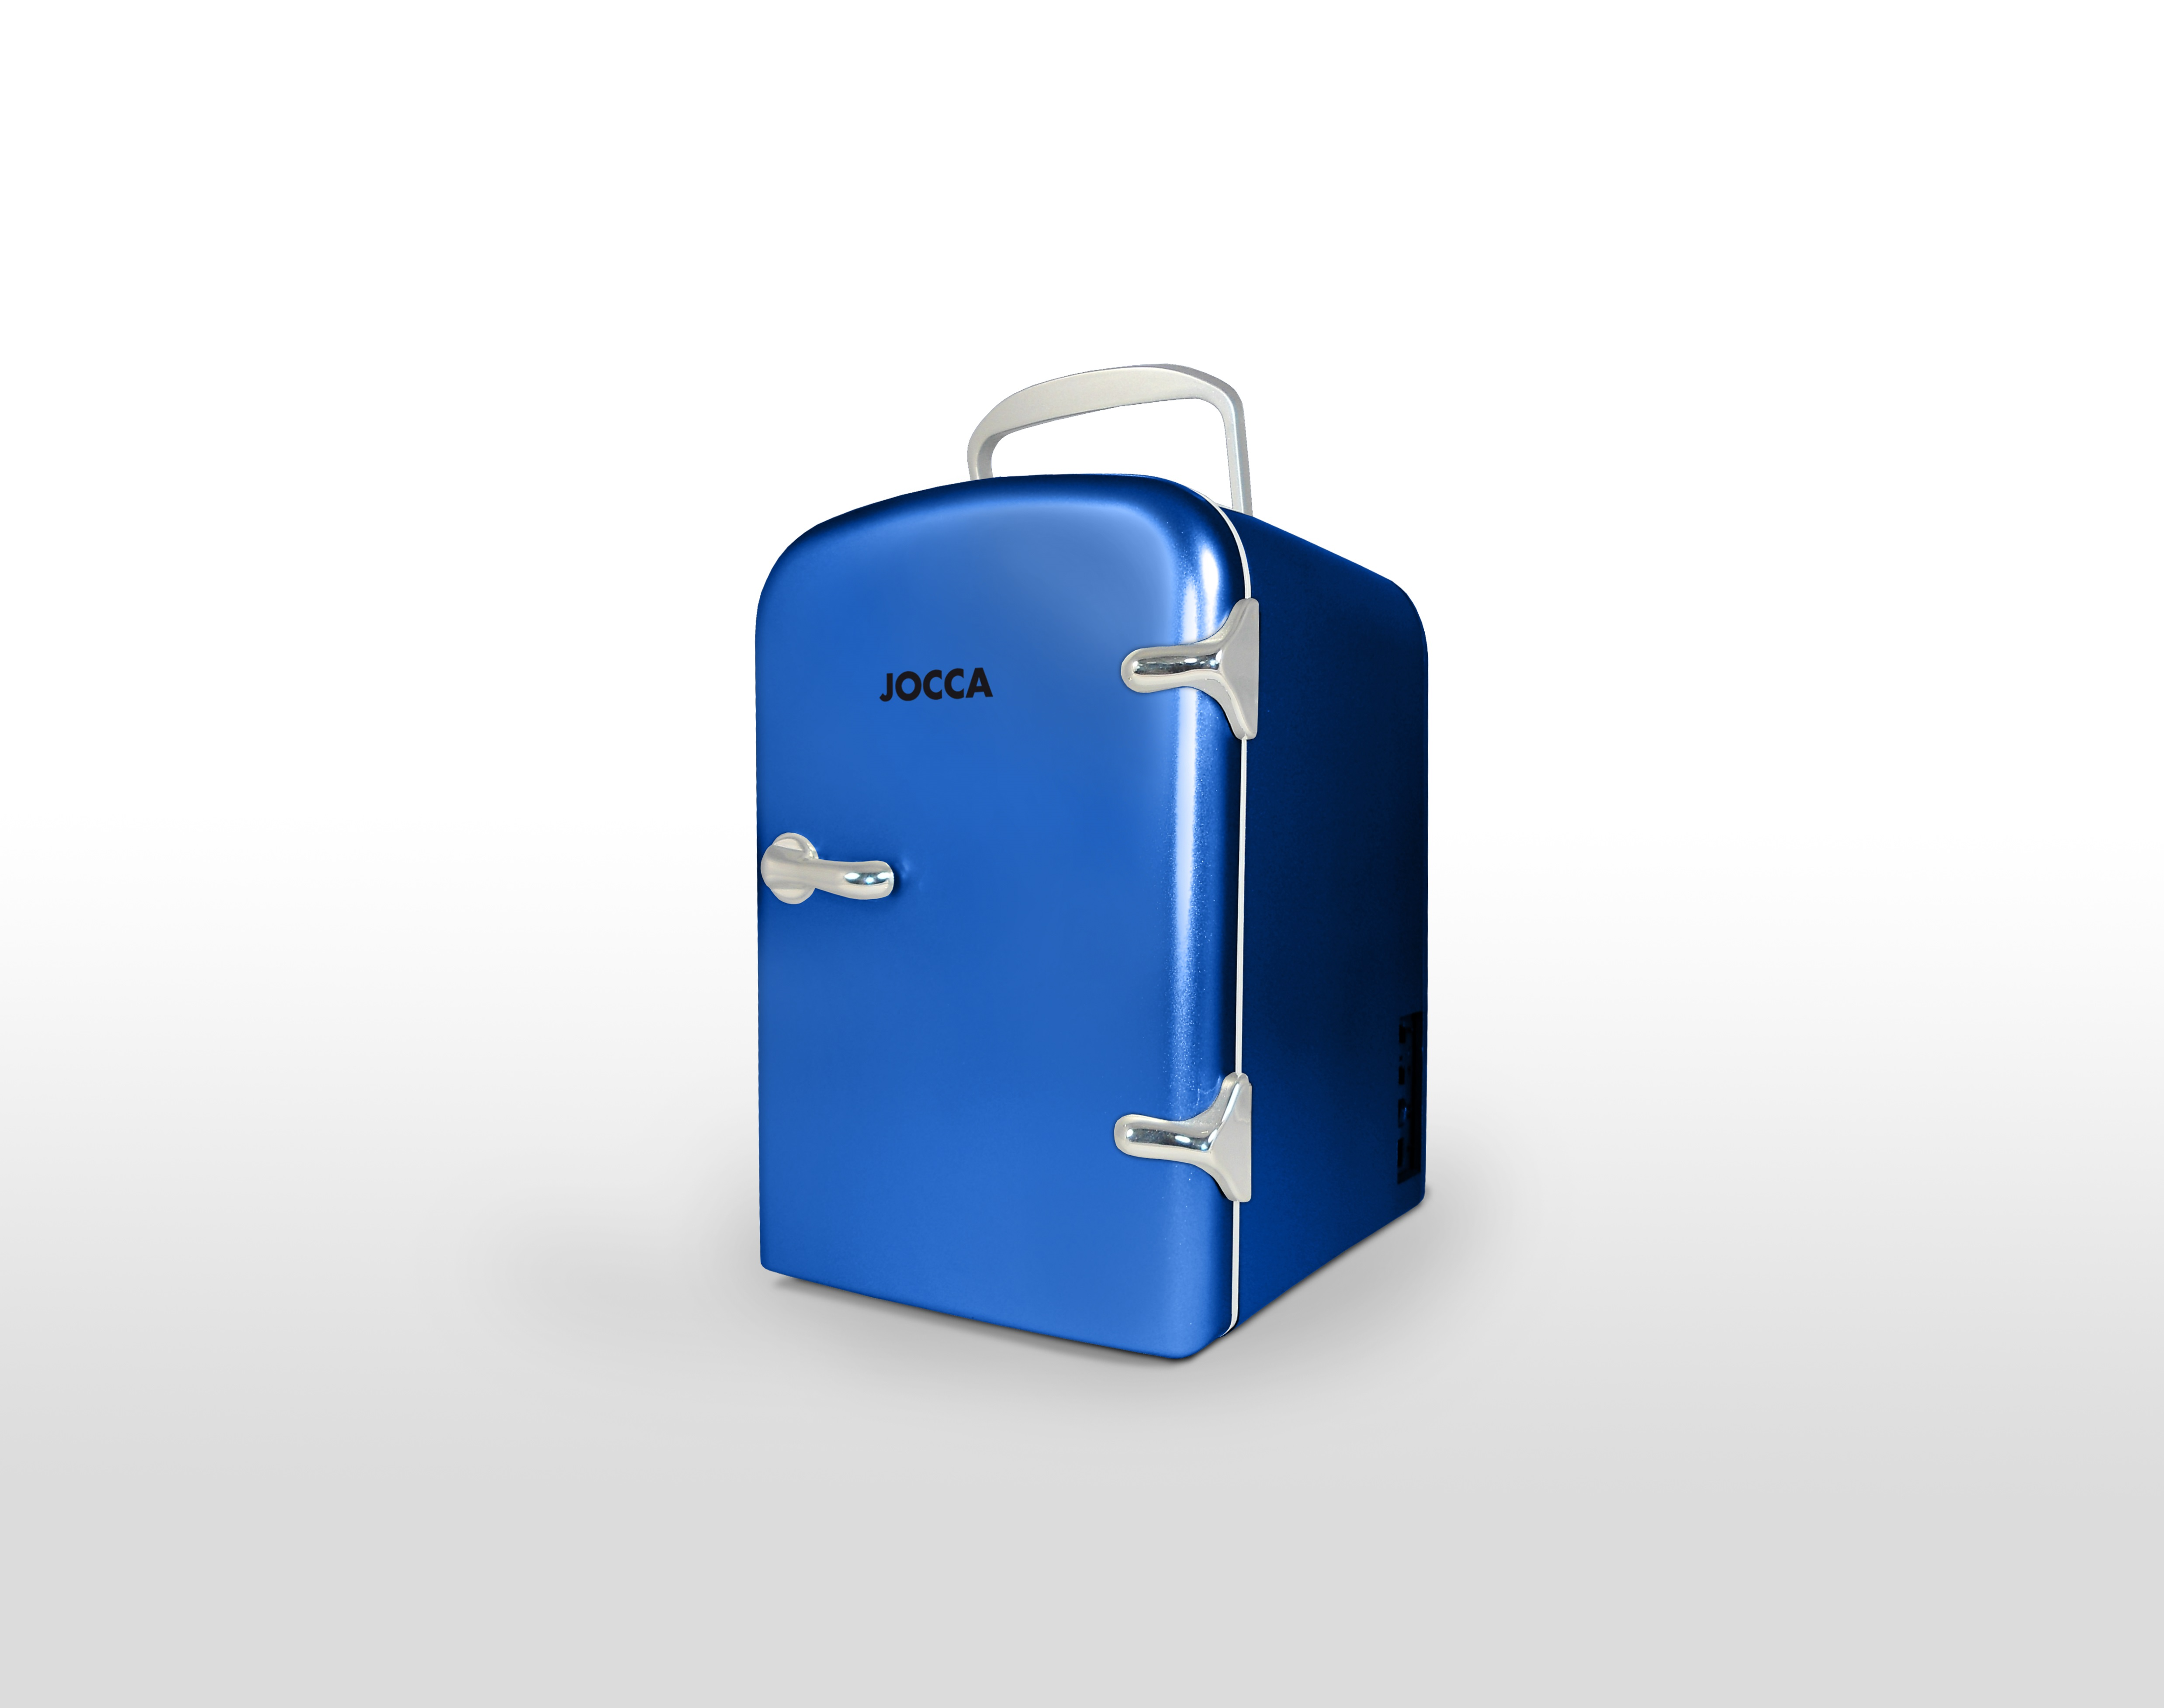 Mini Φορητό Ψυγείο 4L Jocca! 9026A Κόκκινο - JOCCA home & life μικροσυσκευές   ψυγεία συντηρητές κρασιών